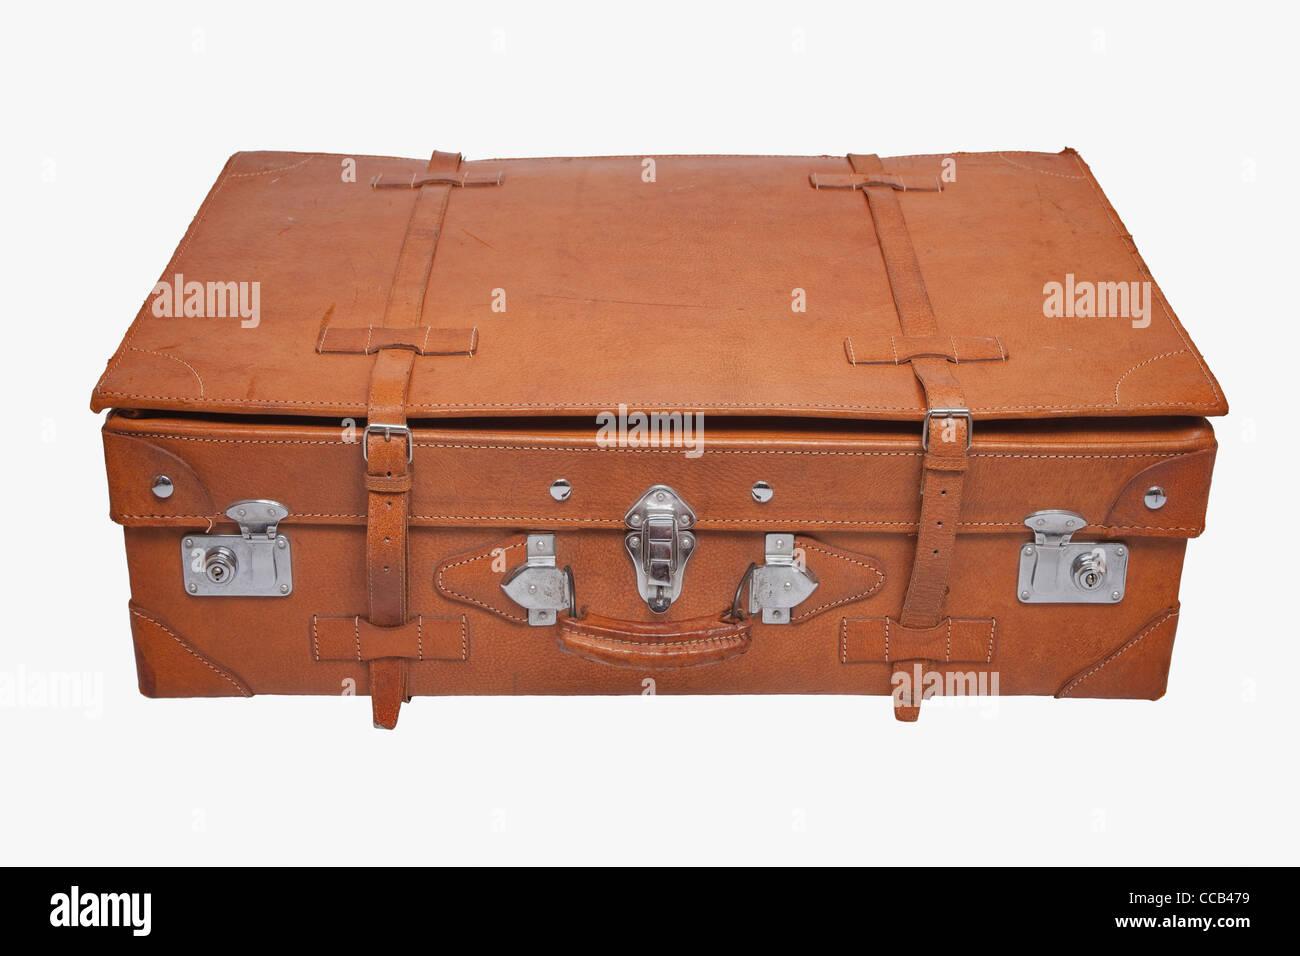 Detailansicht eines alten braunen Lederkoffers   Detail photo of a old brown leather suitcase - Stock Image